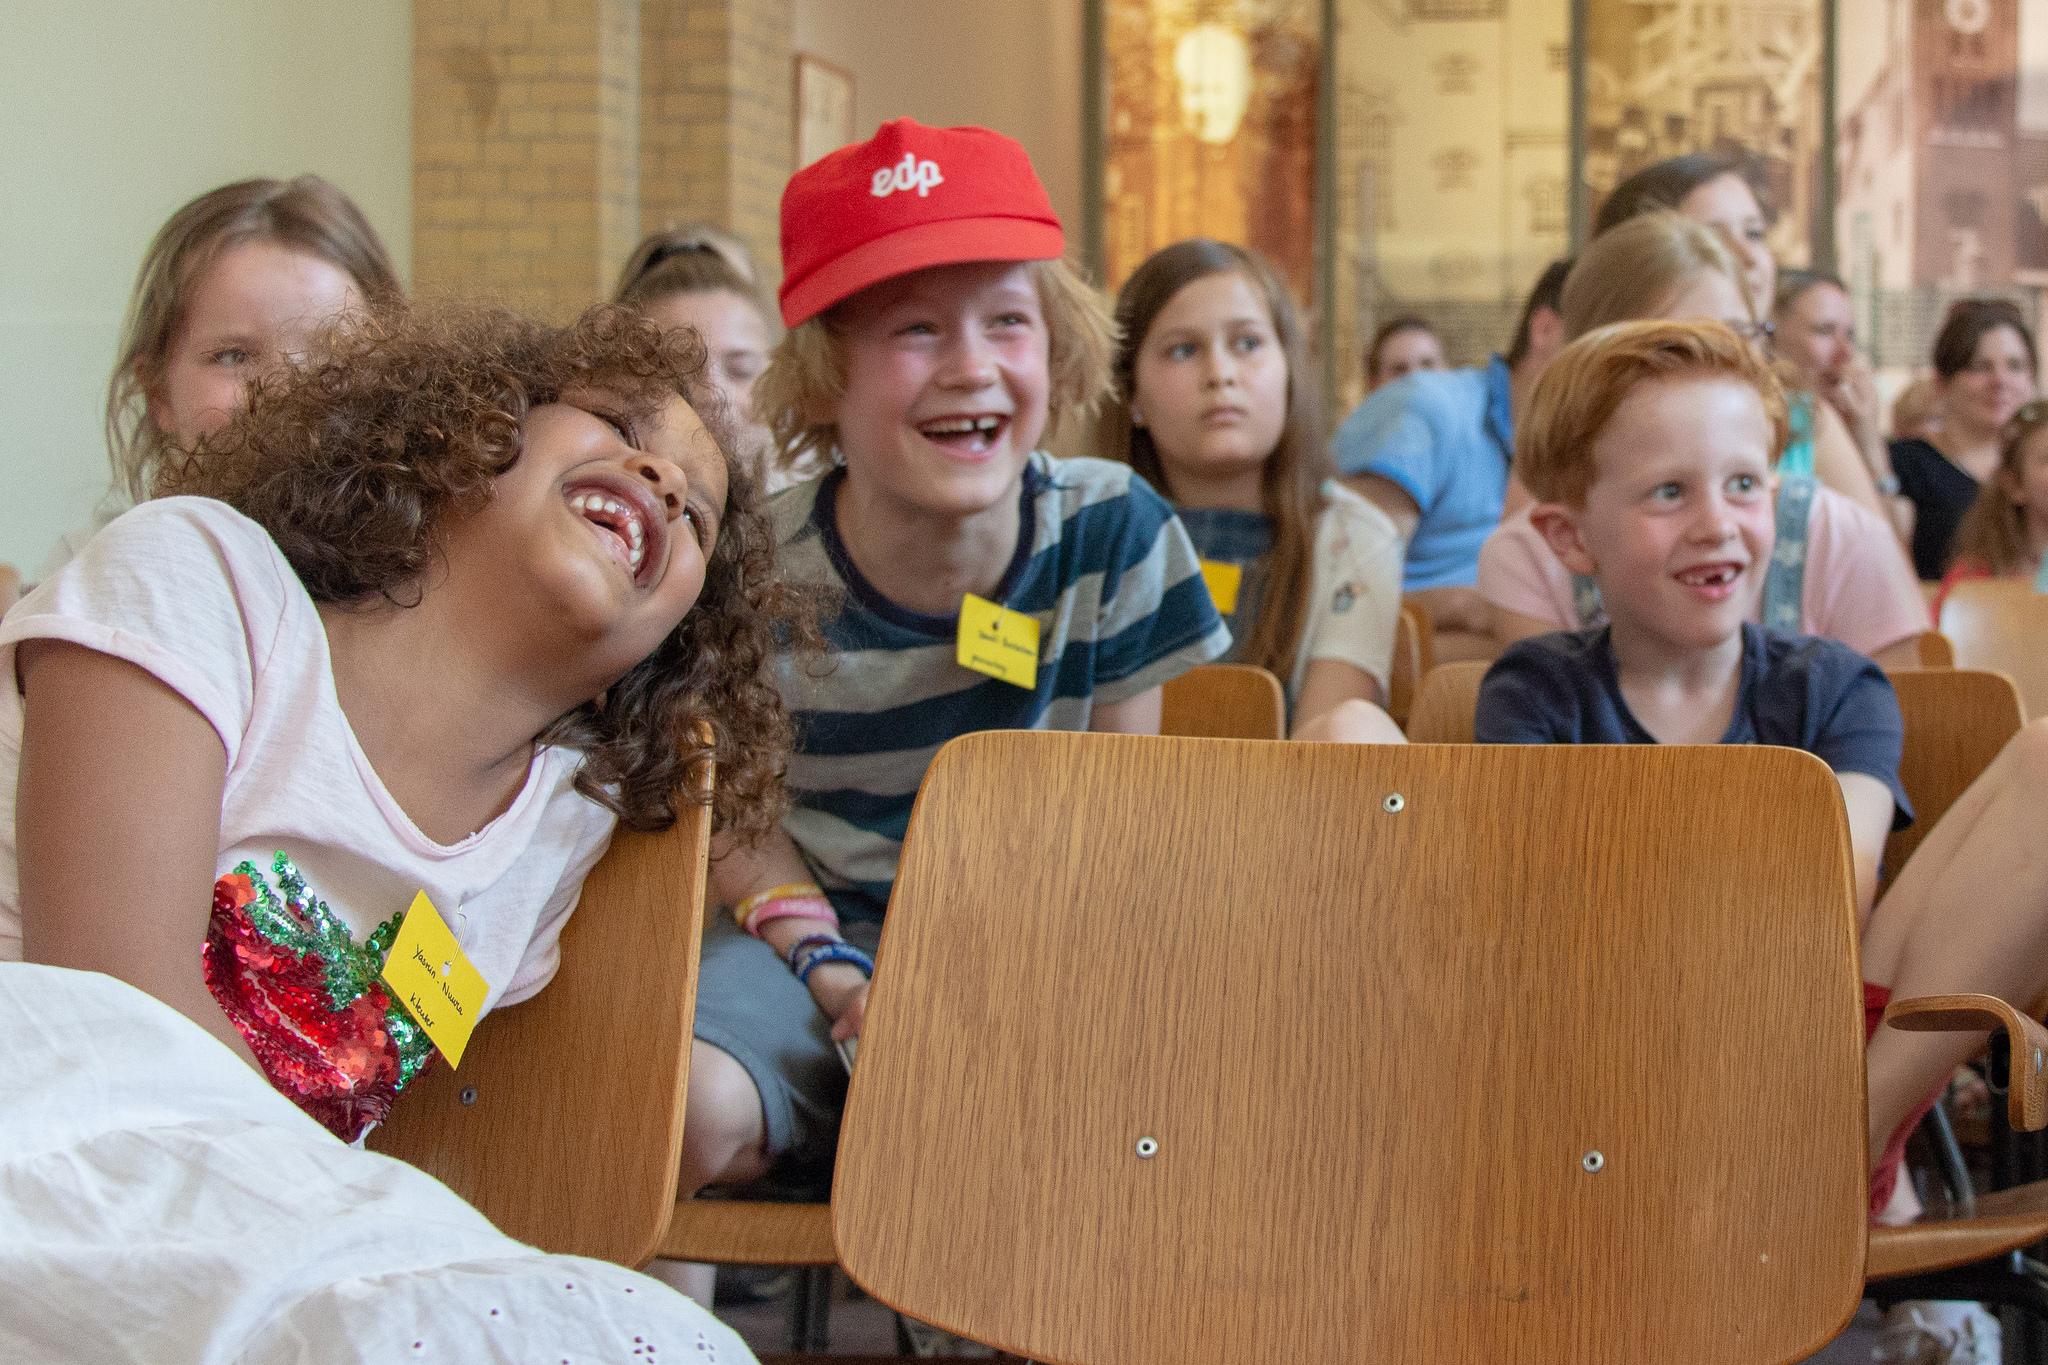 Kinderdienst komende zondag in de Warmoes!